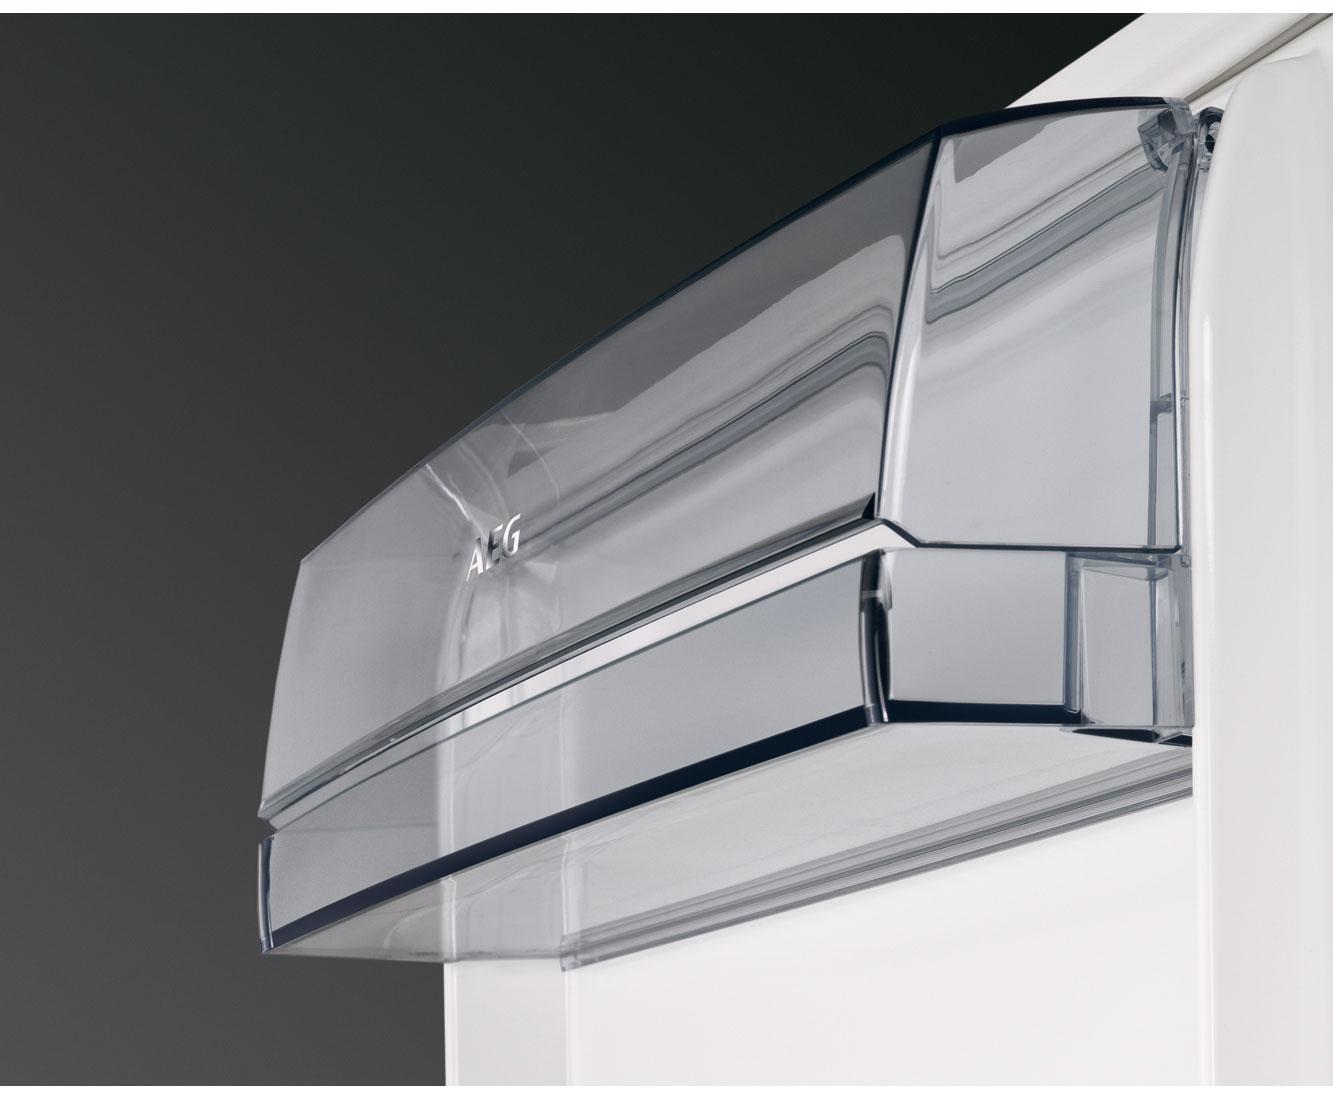 Aeg Kühlschrank Unterbau : Aeg santo skb af unterbau kühlschrank festtür technik a